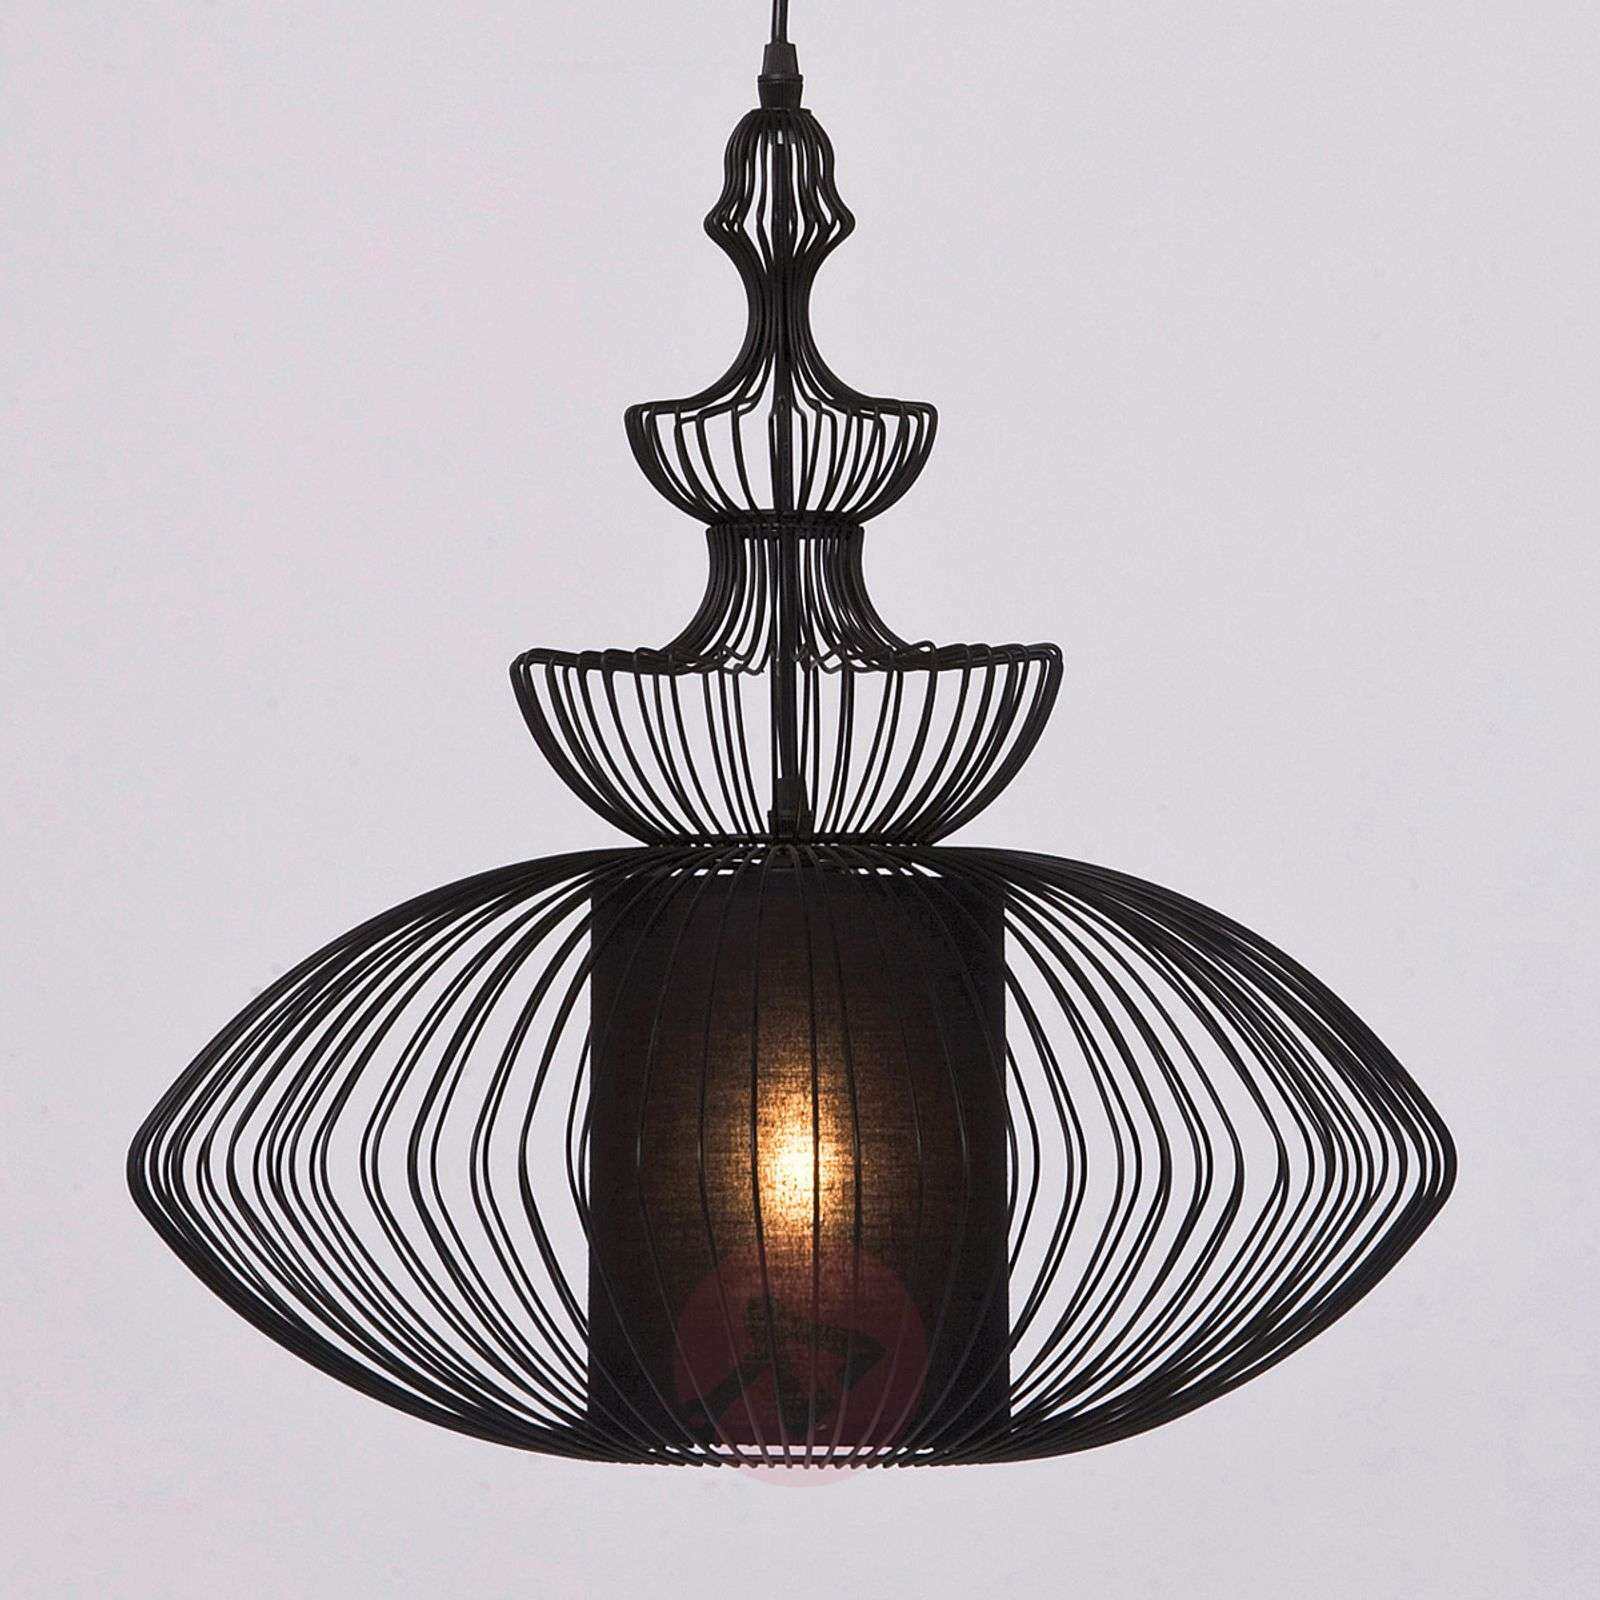 KARE Swing Iron oval hanging light-5517175-01